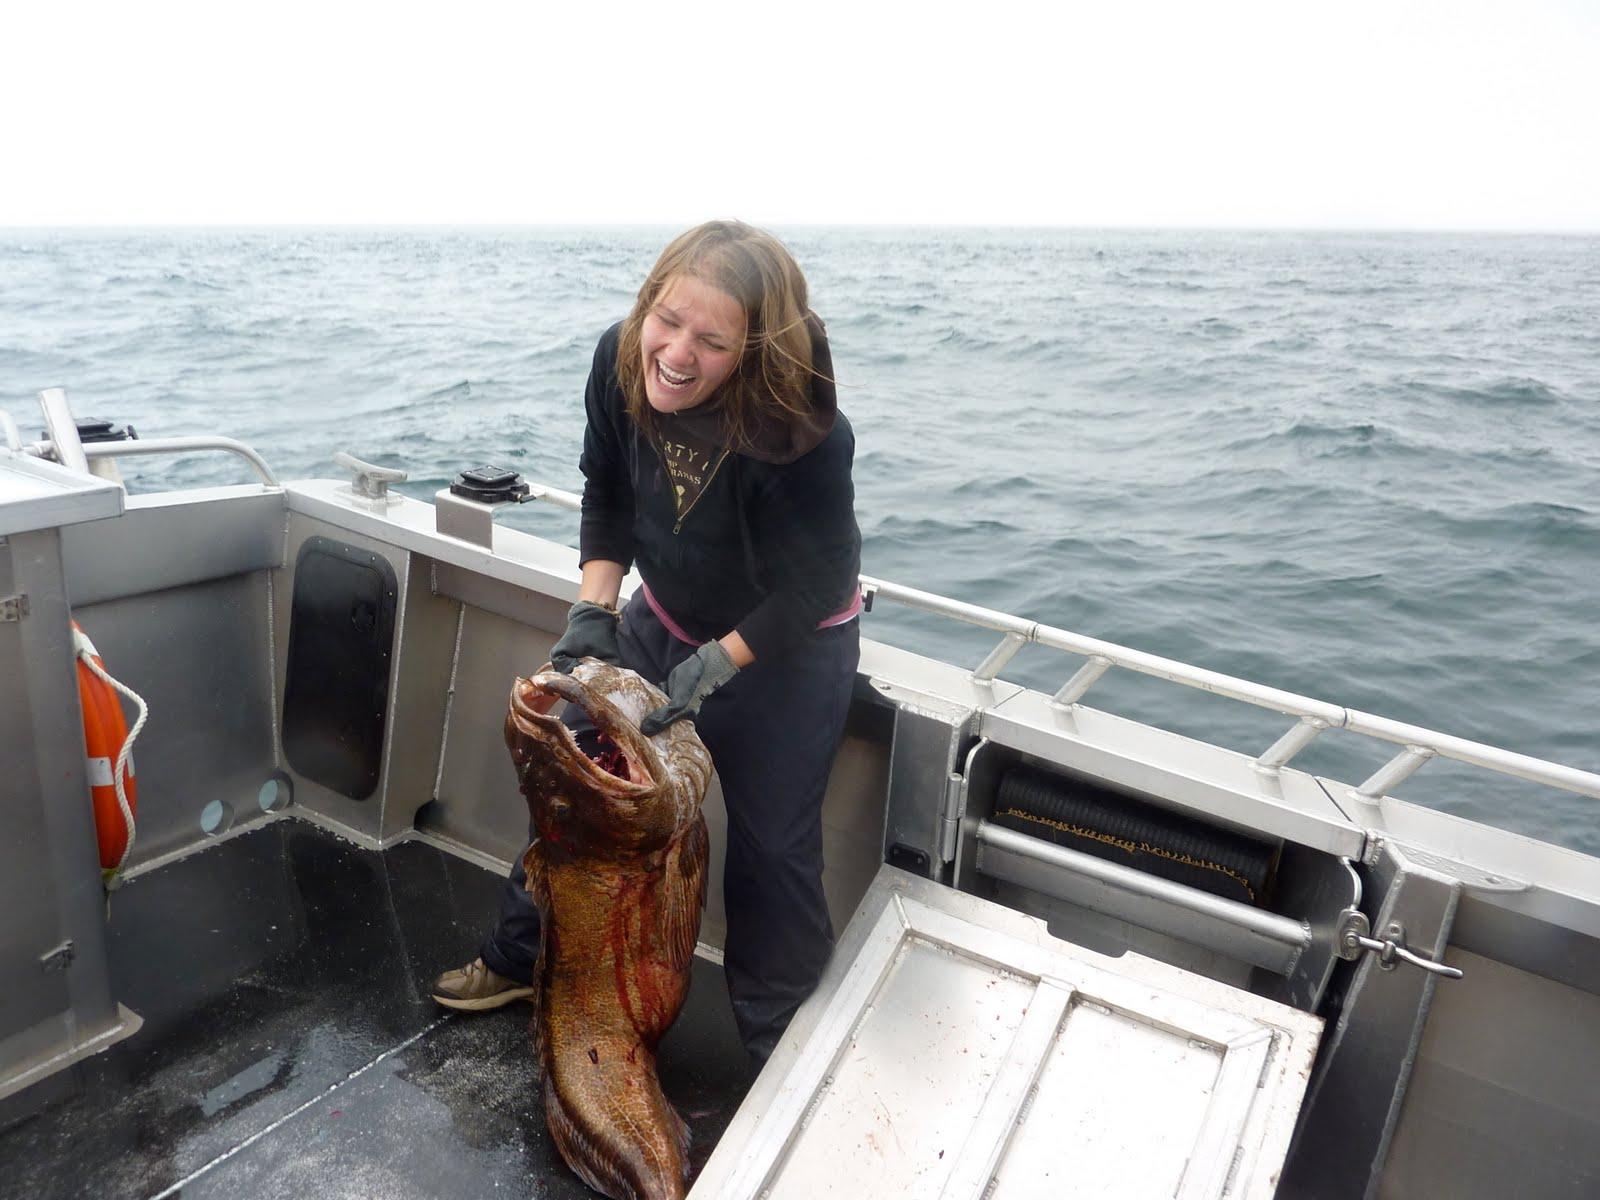 Ryan and katie 39 s road trip deep sea fishing alaskan style for Alaska deep sea fishing